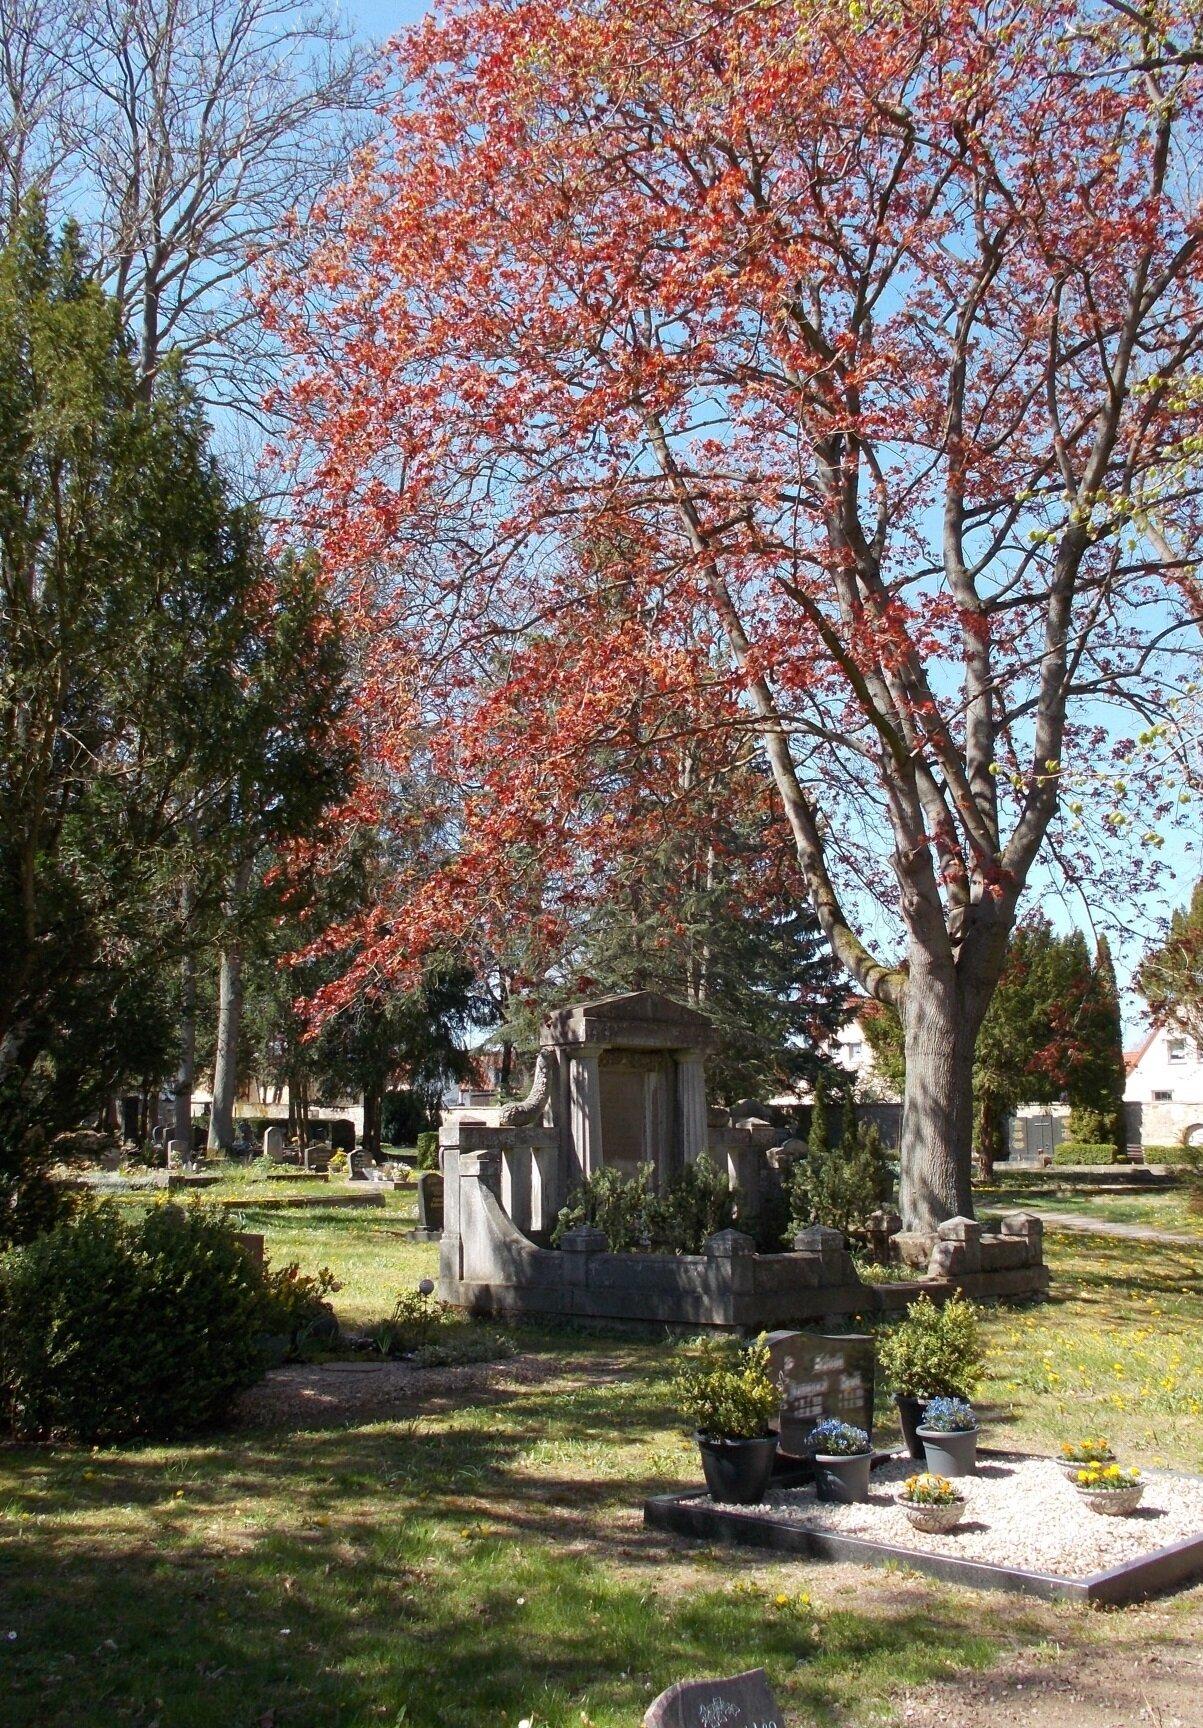 Städtischer Friedhof Querfurt